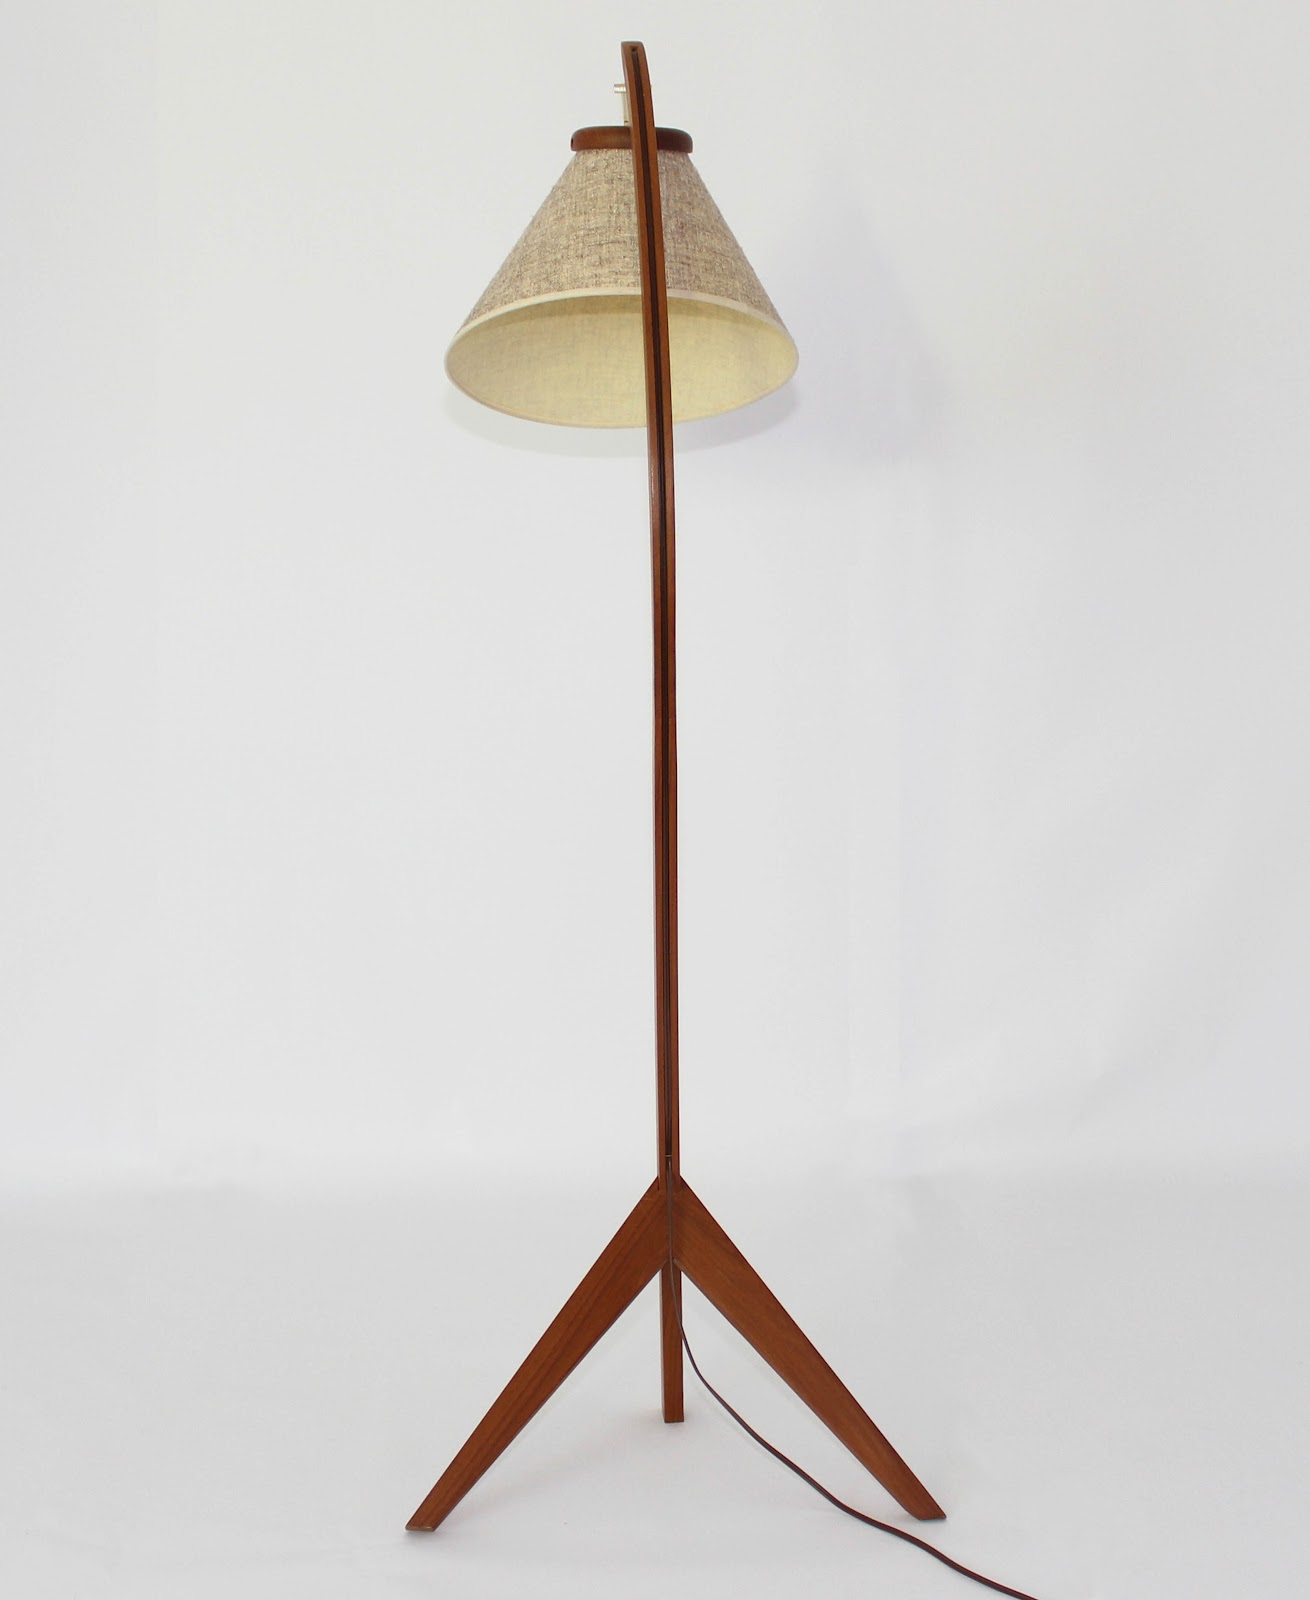 Melrose Mid Century Brass White Shade Floor Lamp: Mansion Decor: Mid Century Danish Teak Bow Floor Lamp